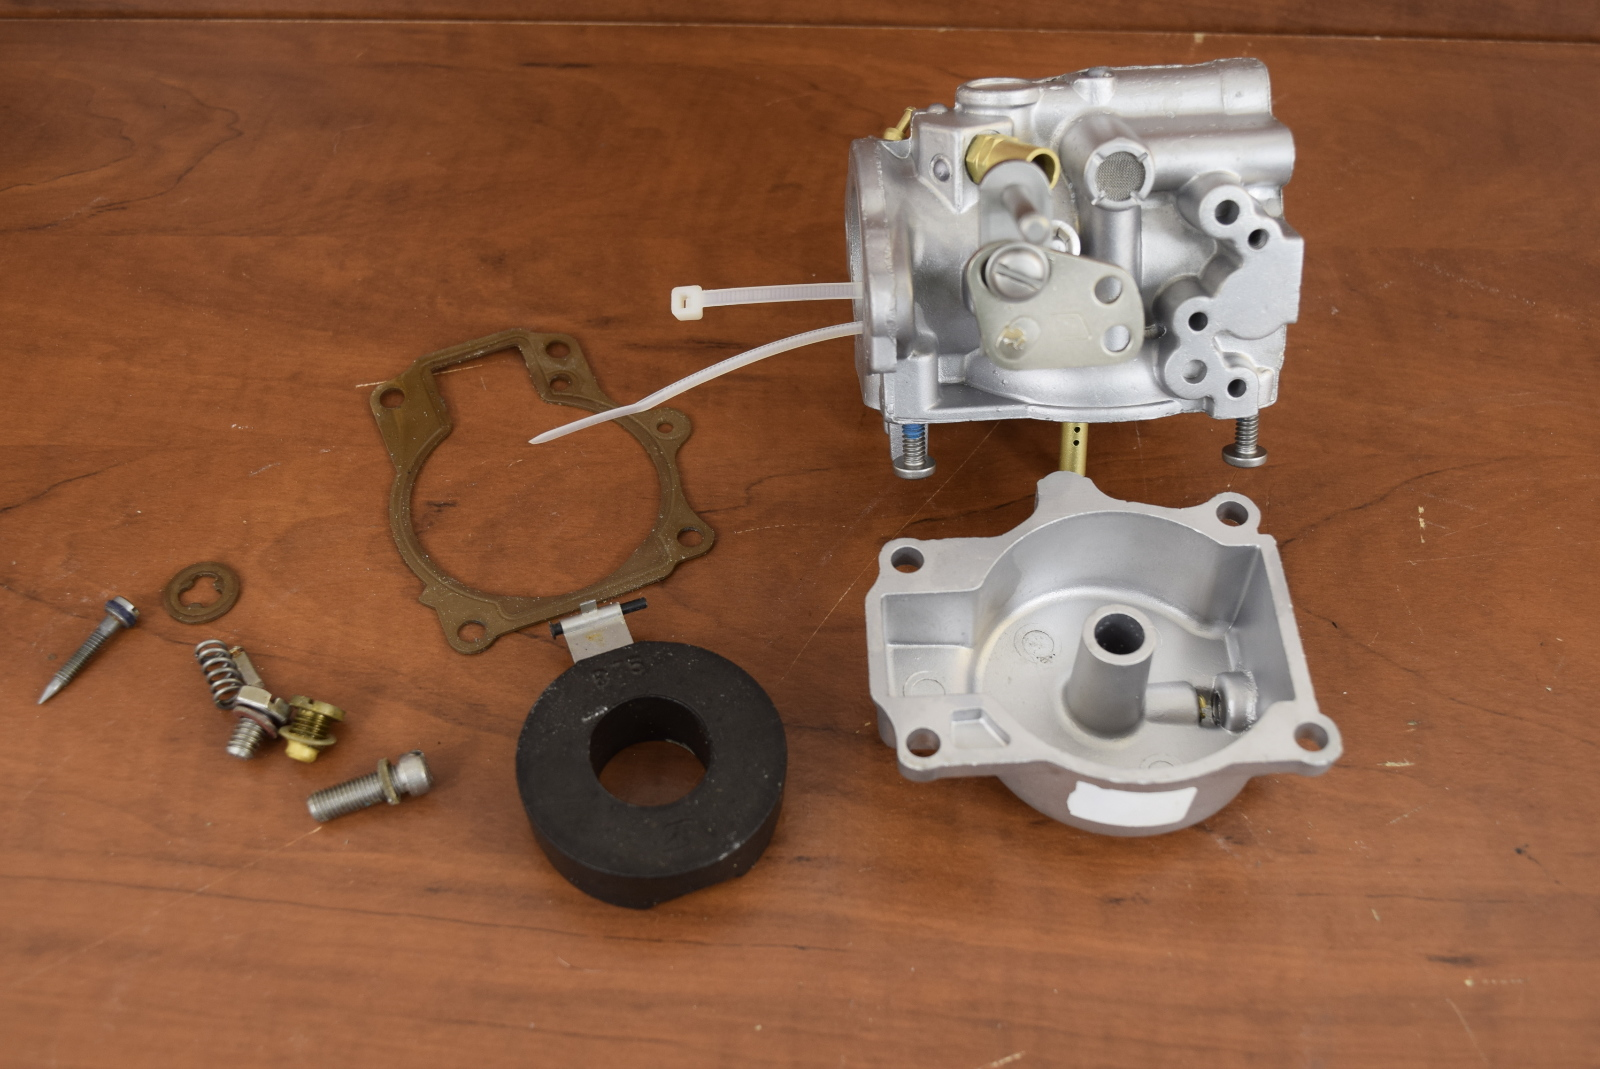 REBUILT! 1991-1992 Johnson Evinrude Carburetor 433237 C# 433236 60 70 HP